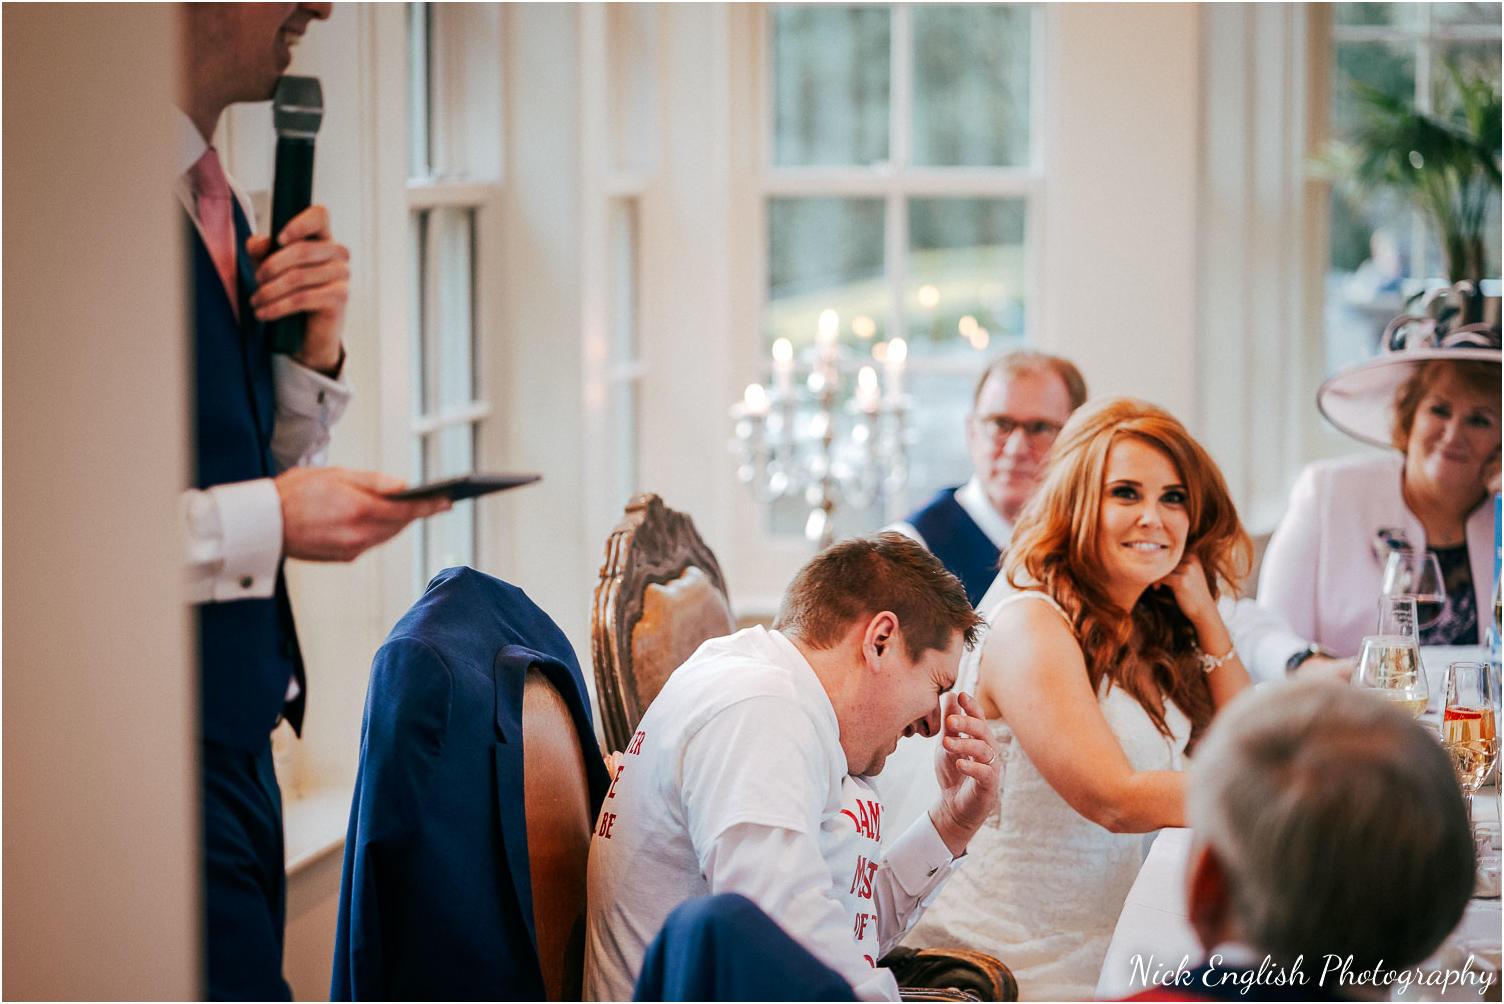 Mitton_Hall_Wedding_Photographer-180.jpg